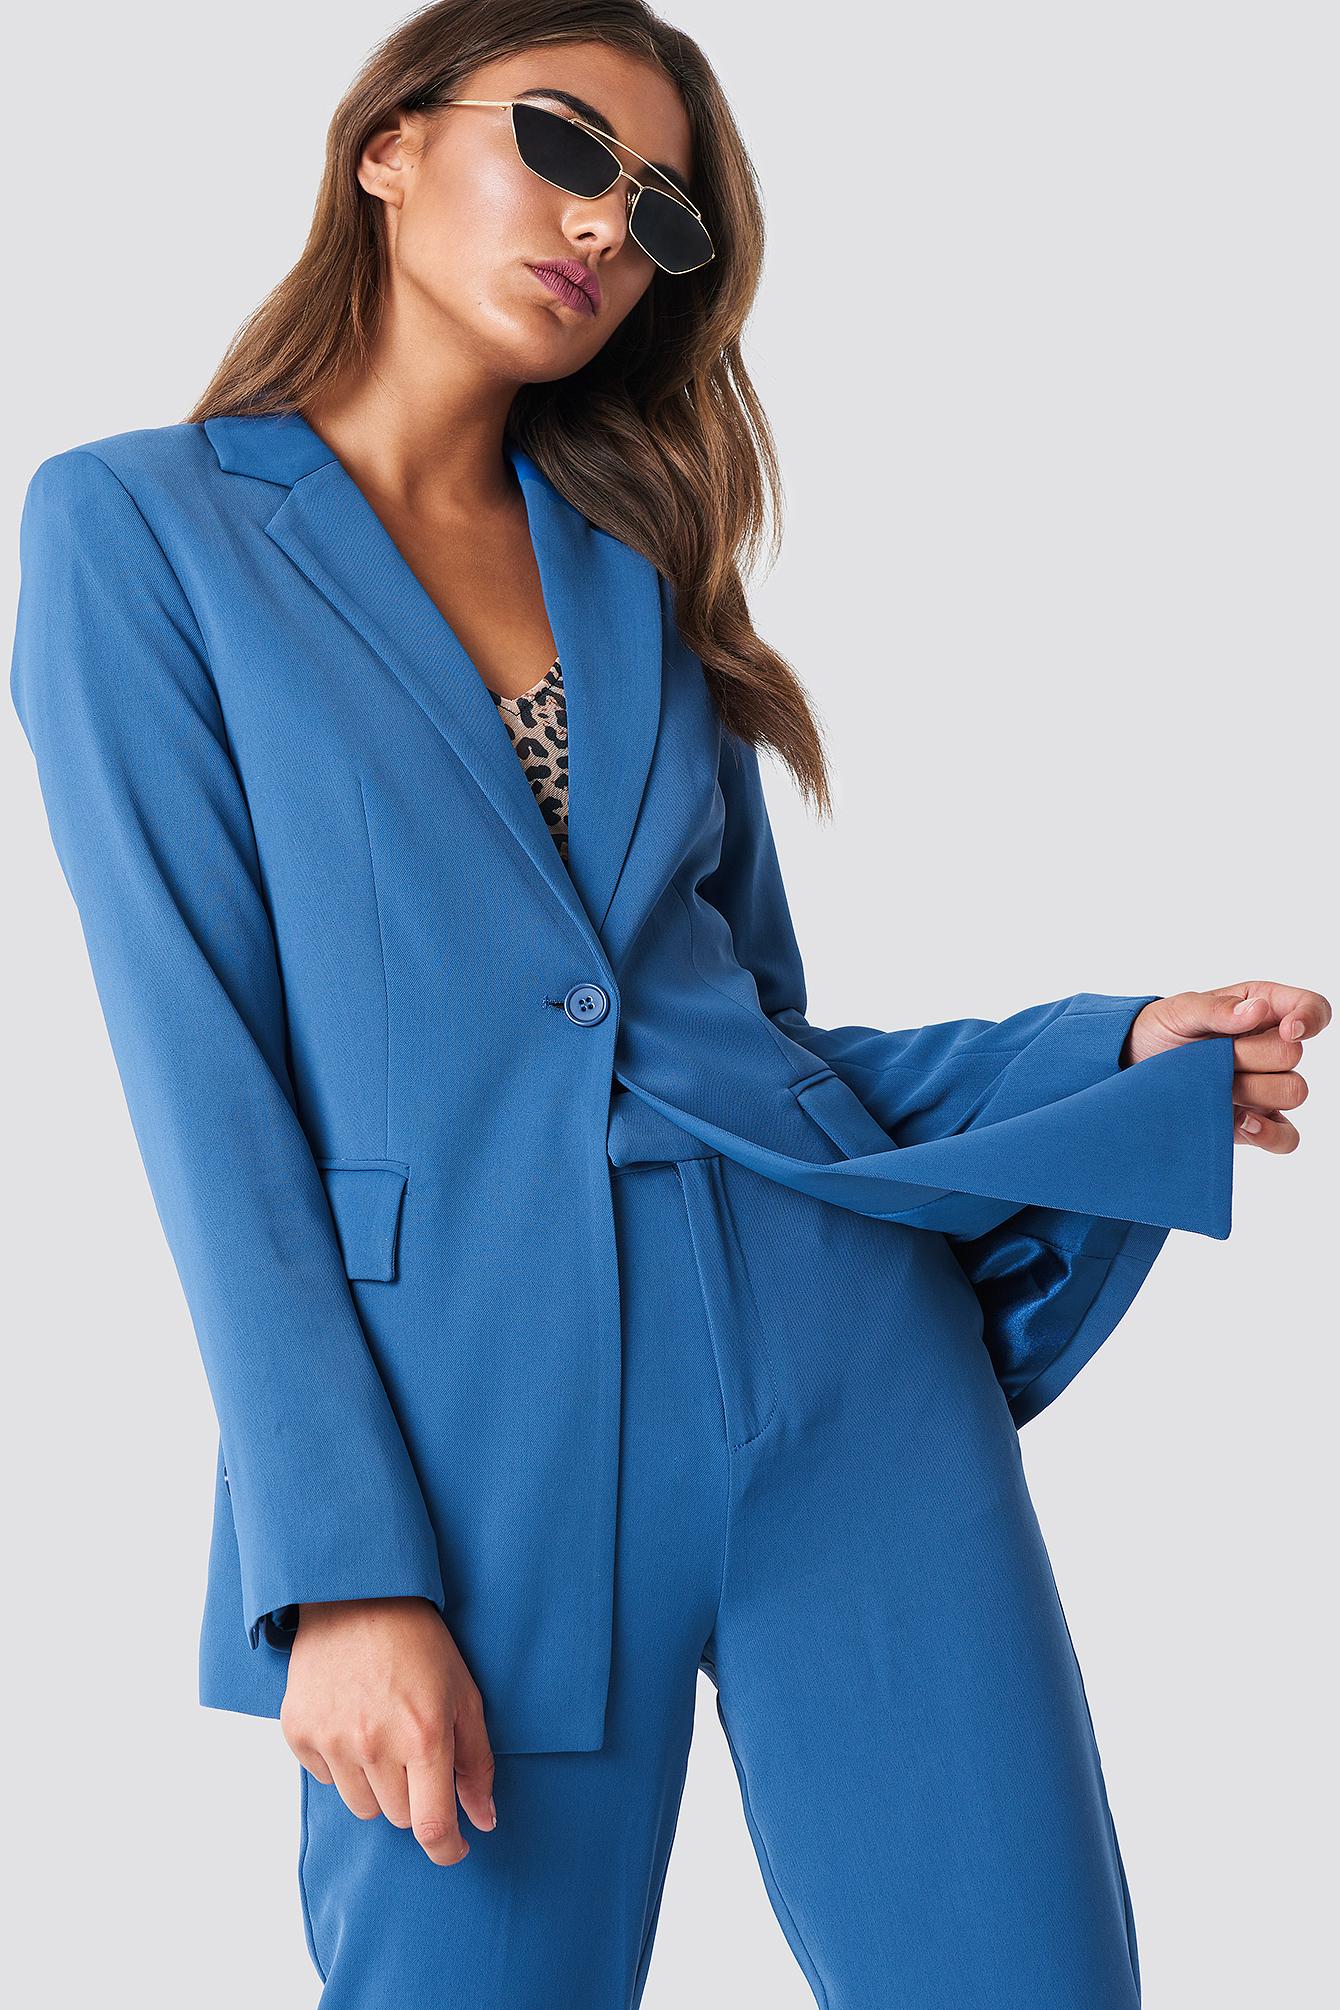 NAKDCLASSIC Tailored Blazer - Blue